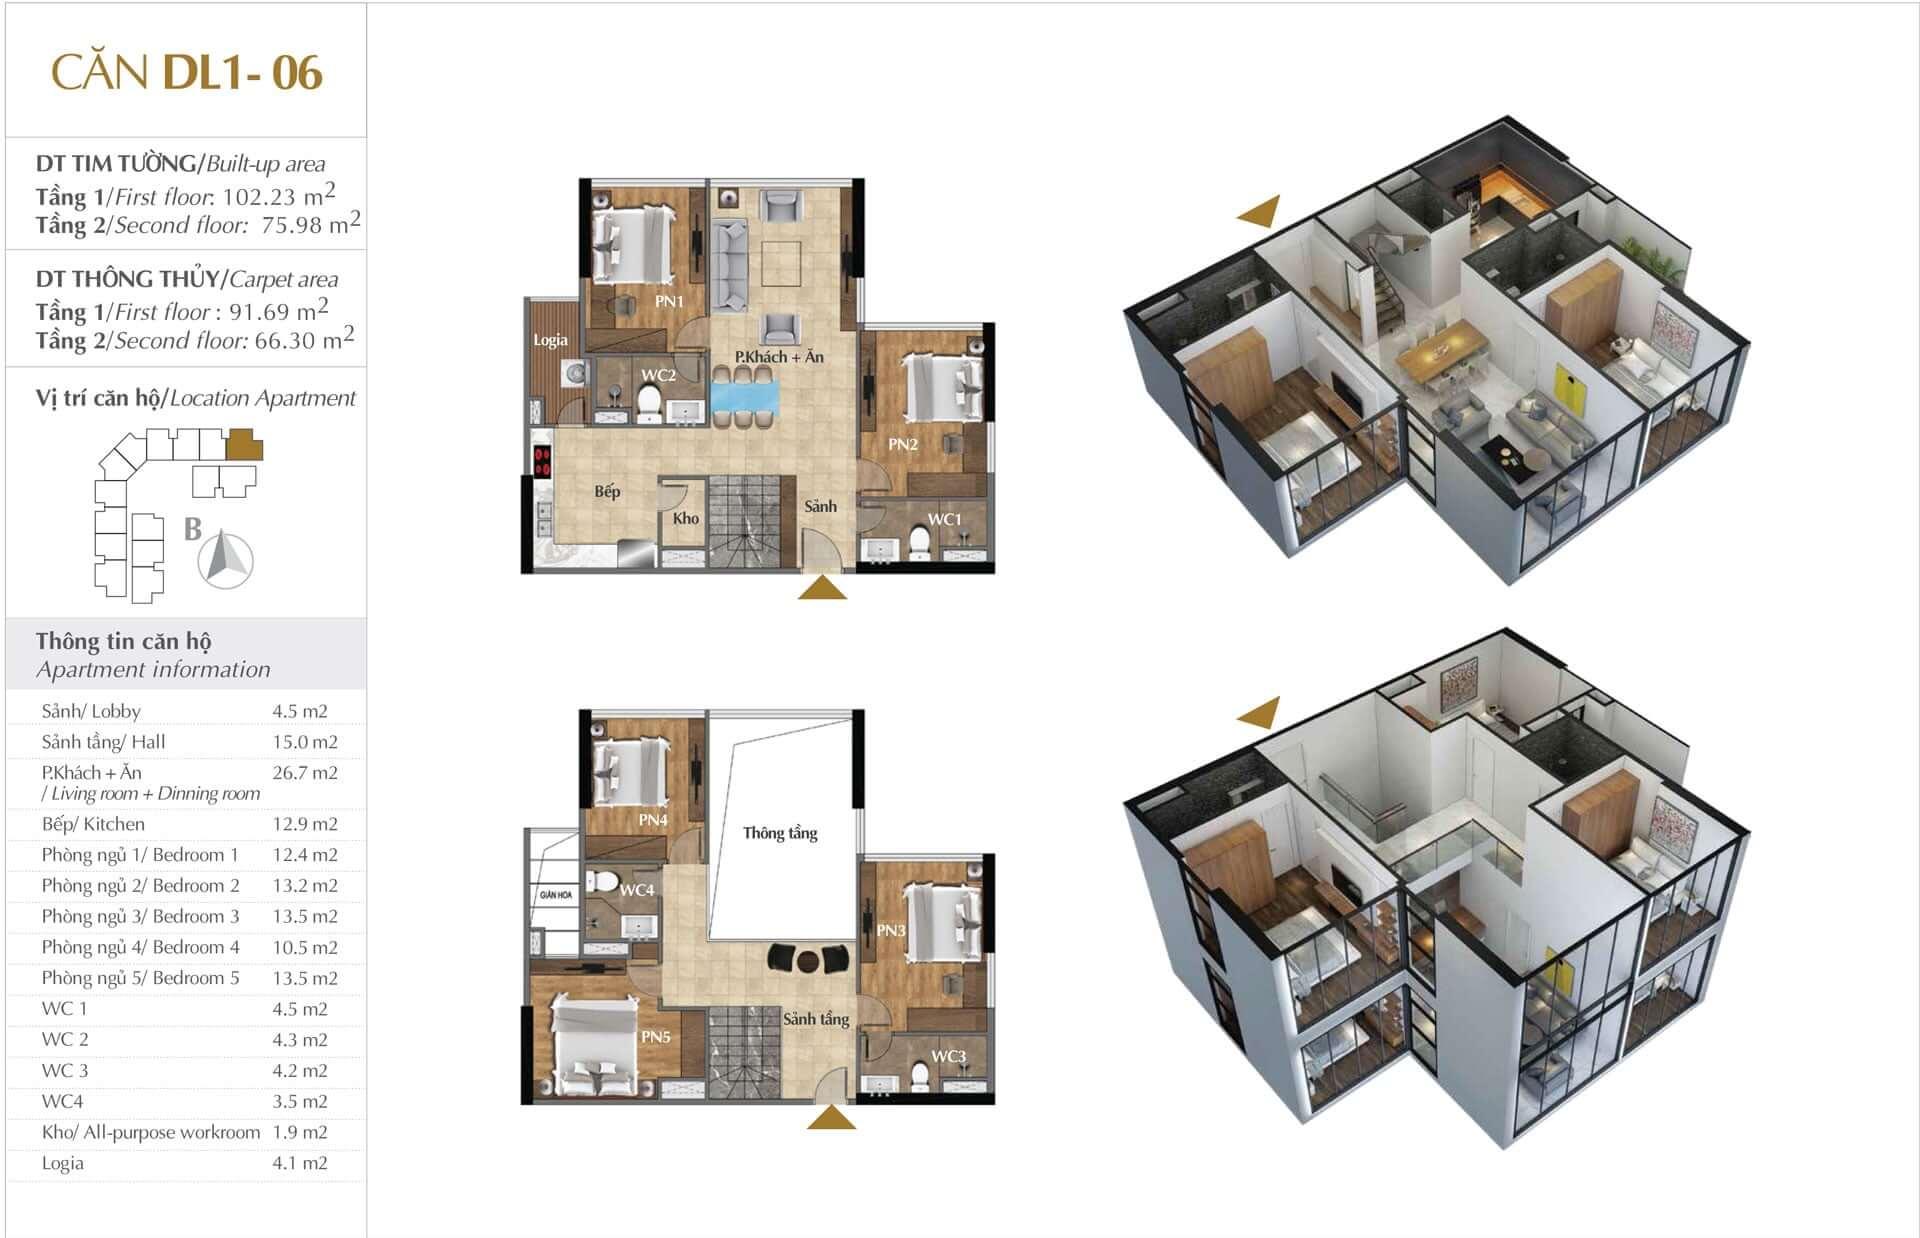 Thiết kế căn DL1 - 06